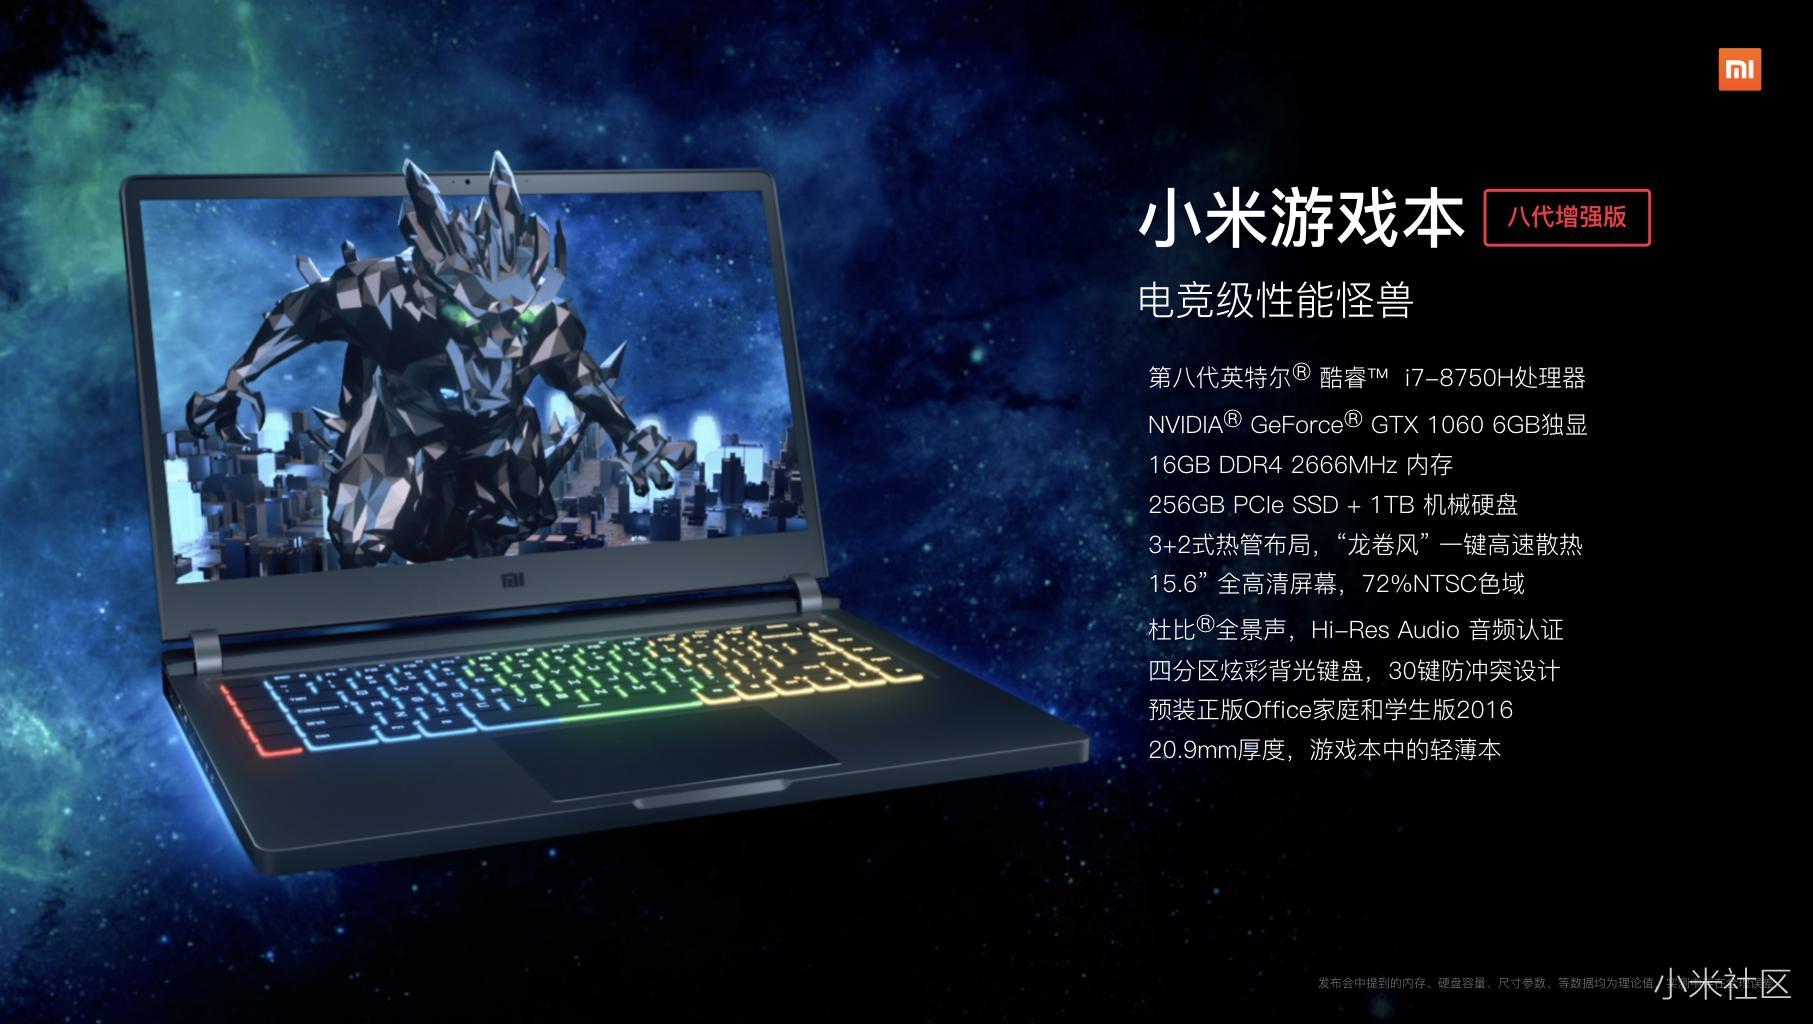 Xiaomi Notebook Pro GTX 1050 & Mi Gaming Laptop Refresh - TechTablets